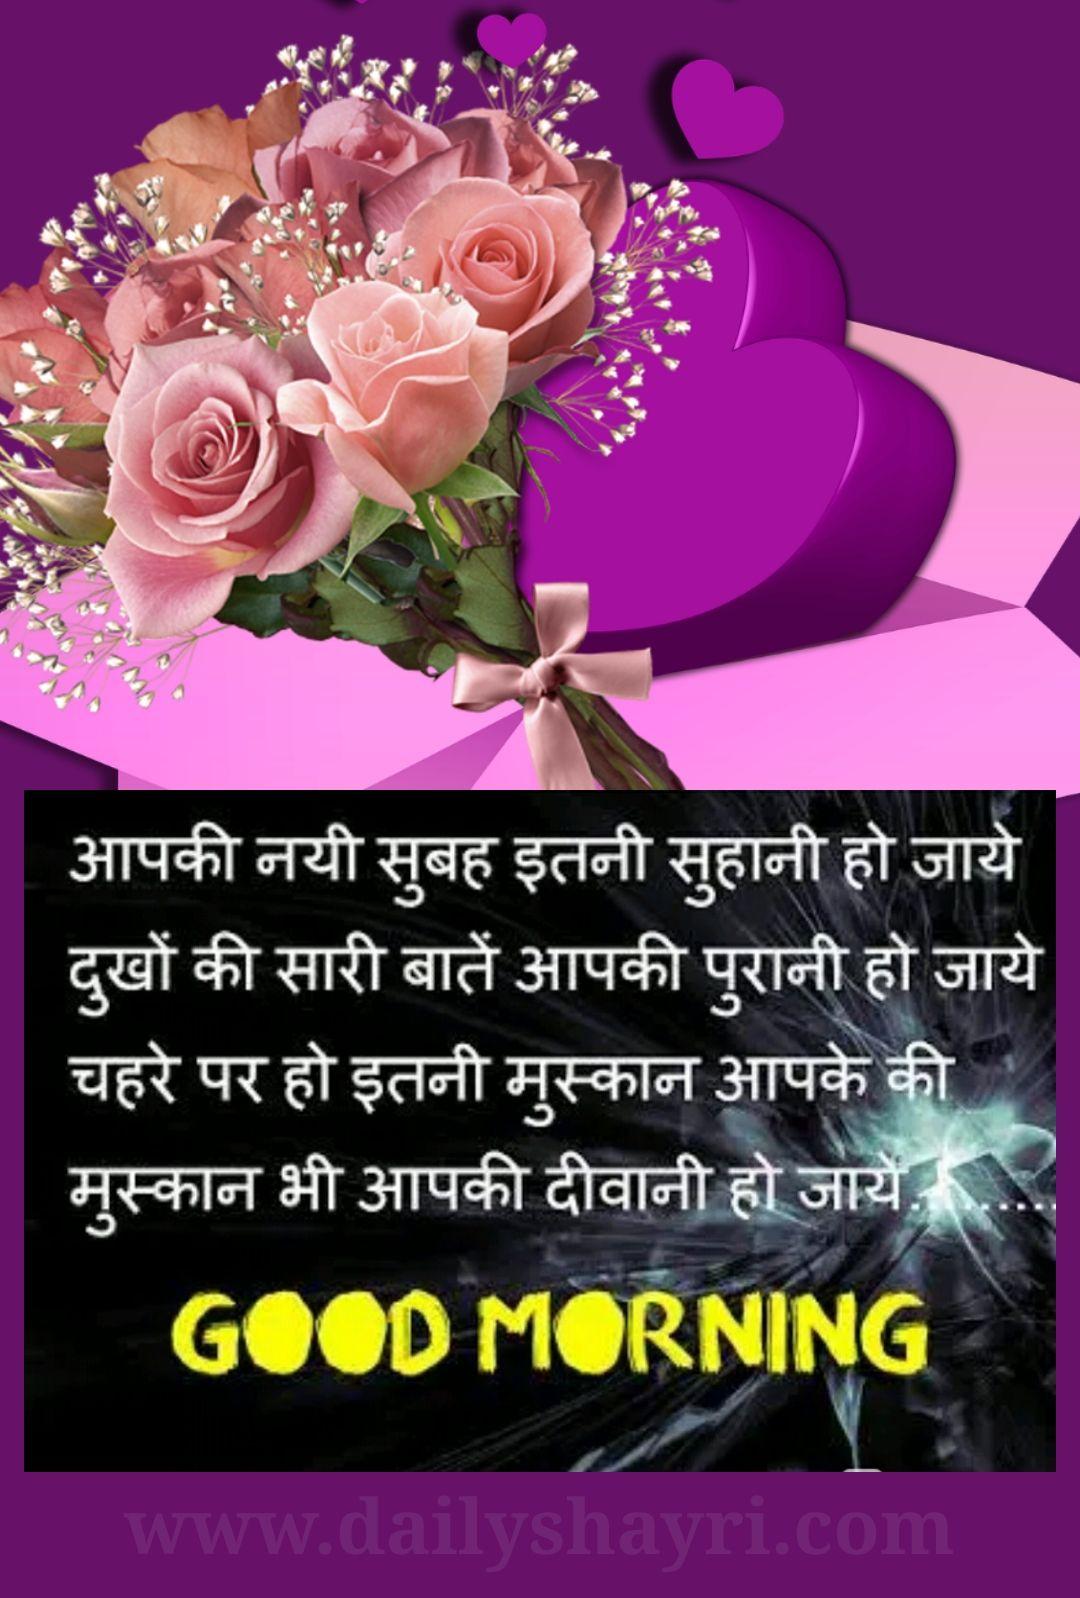 550 नया गुड मॉर्निंग शायरी फोटो। – Hindi Shayari Love ...